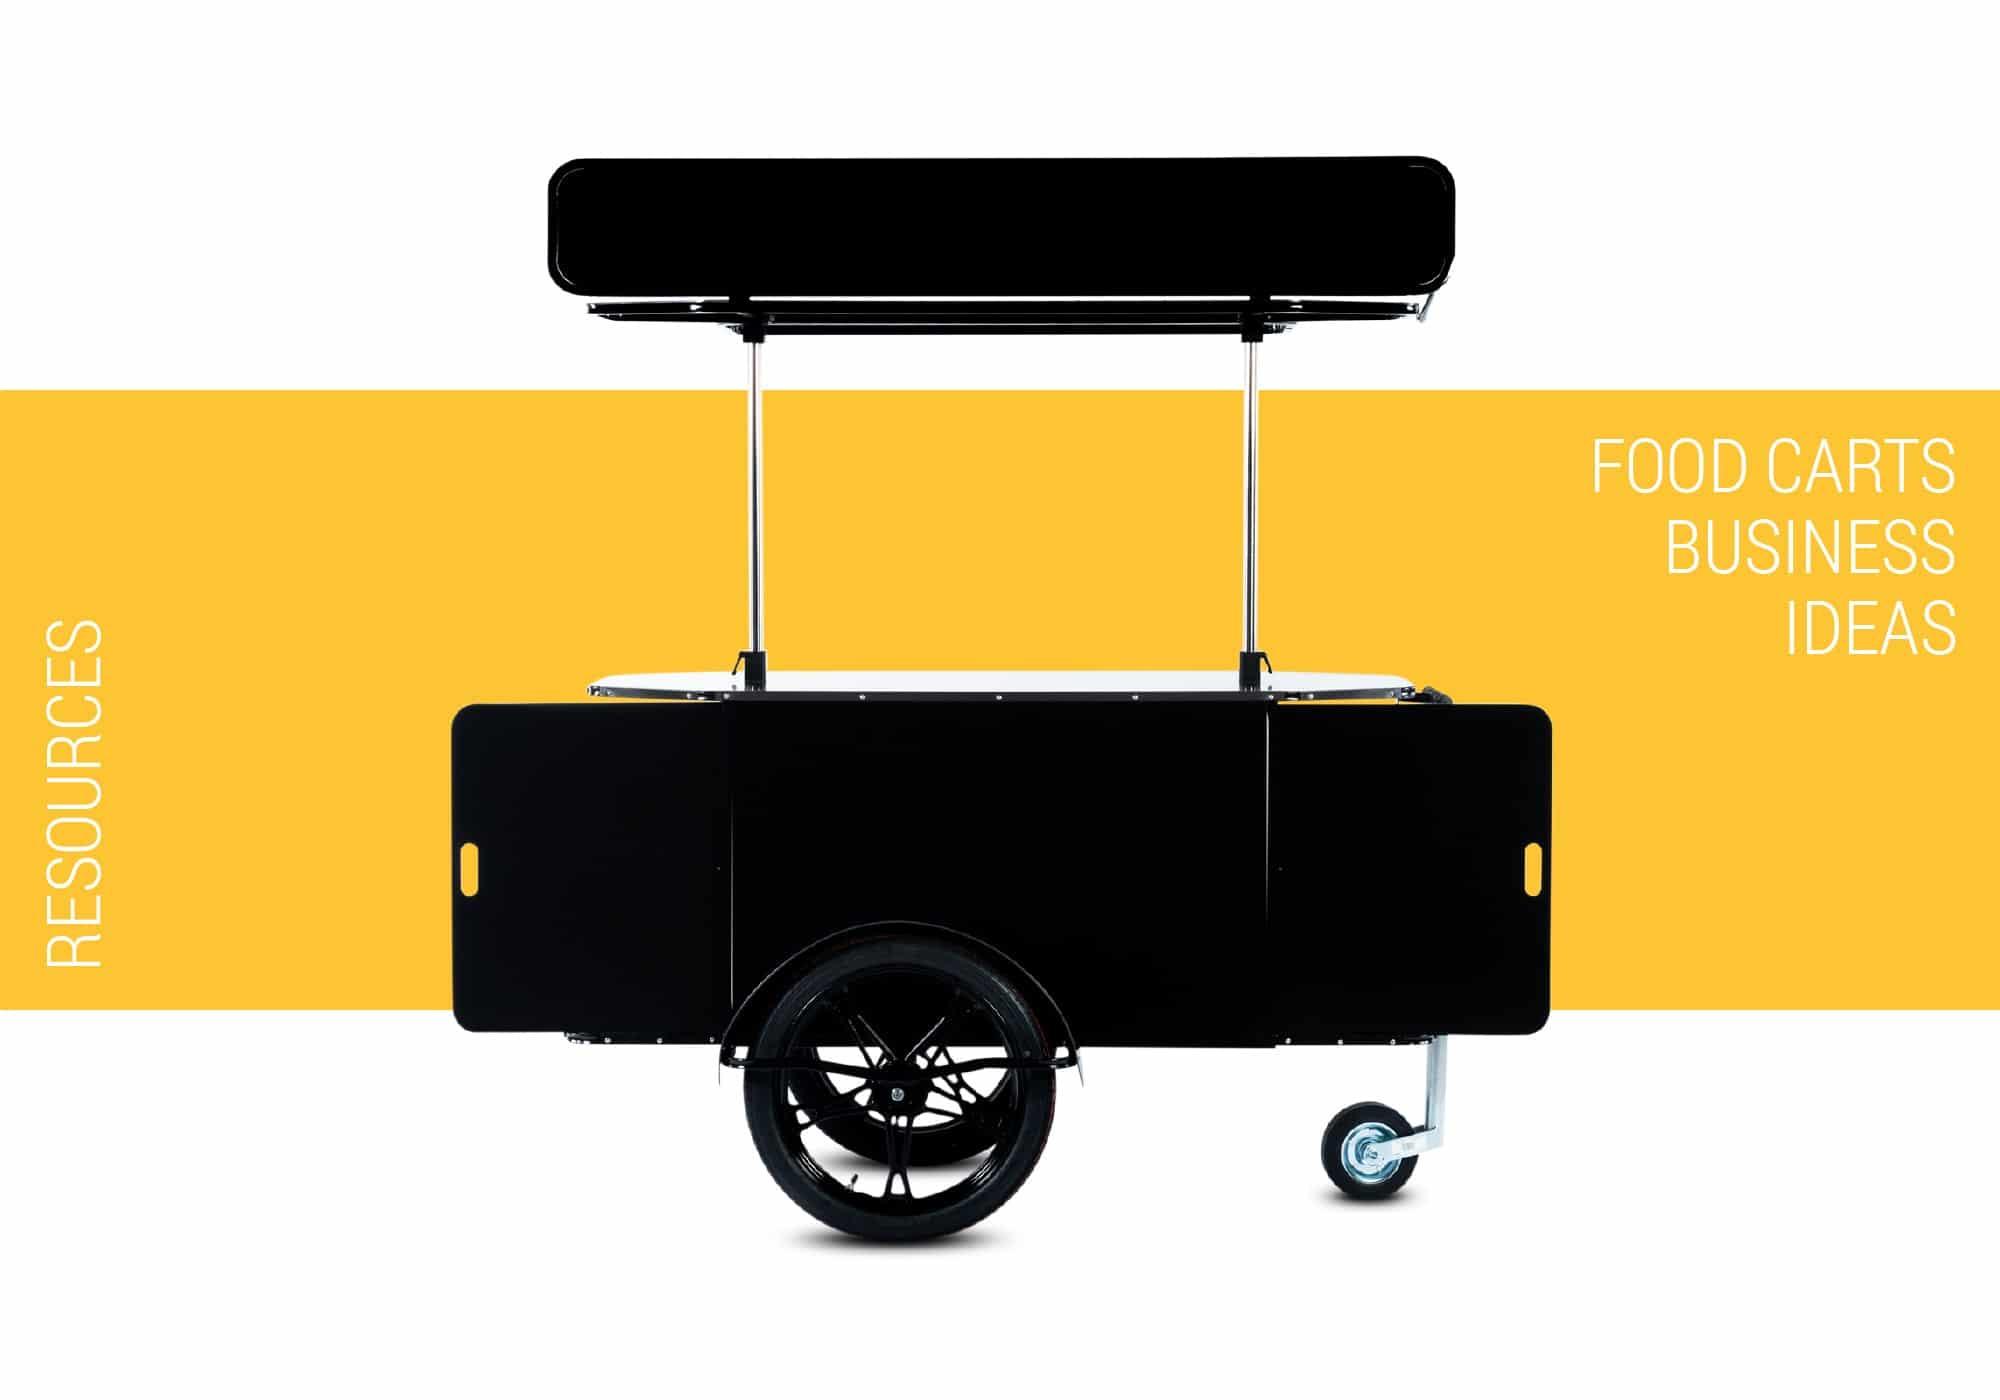 BizzOnWheels street food business ideas